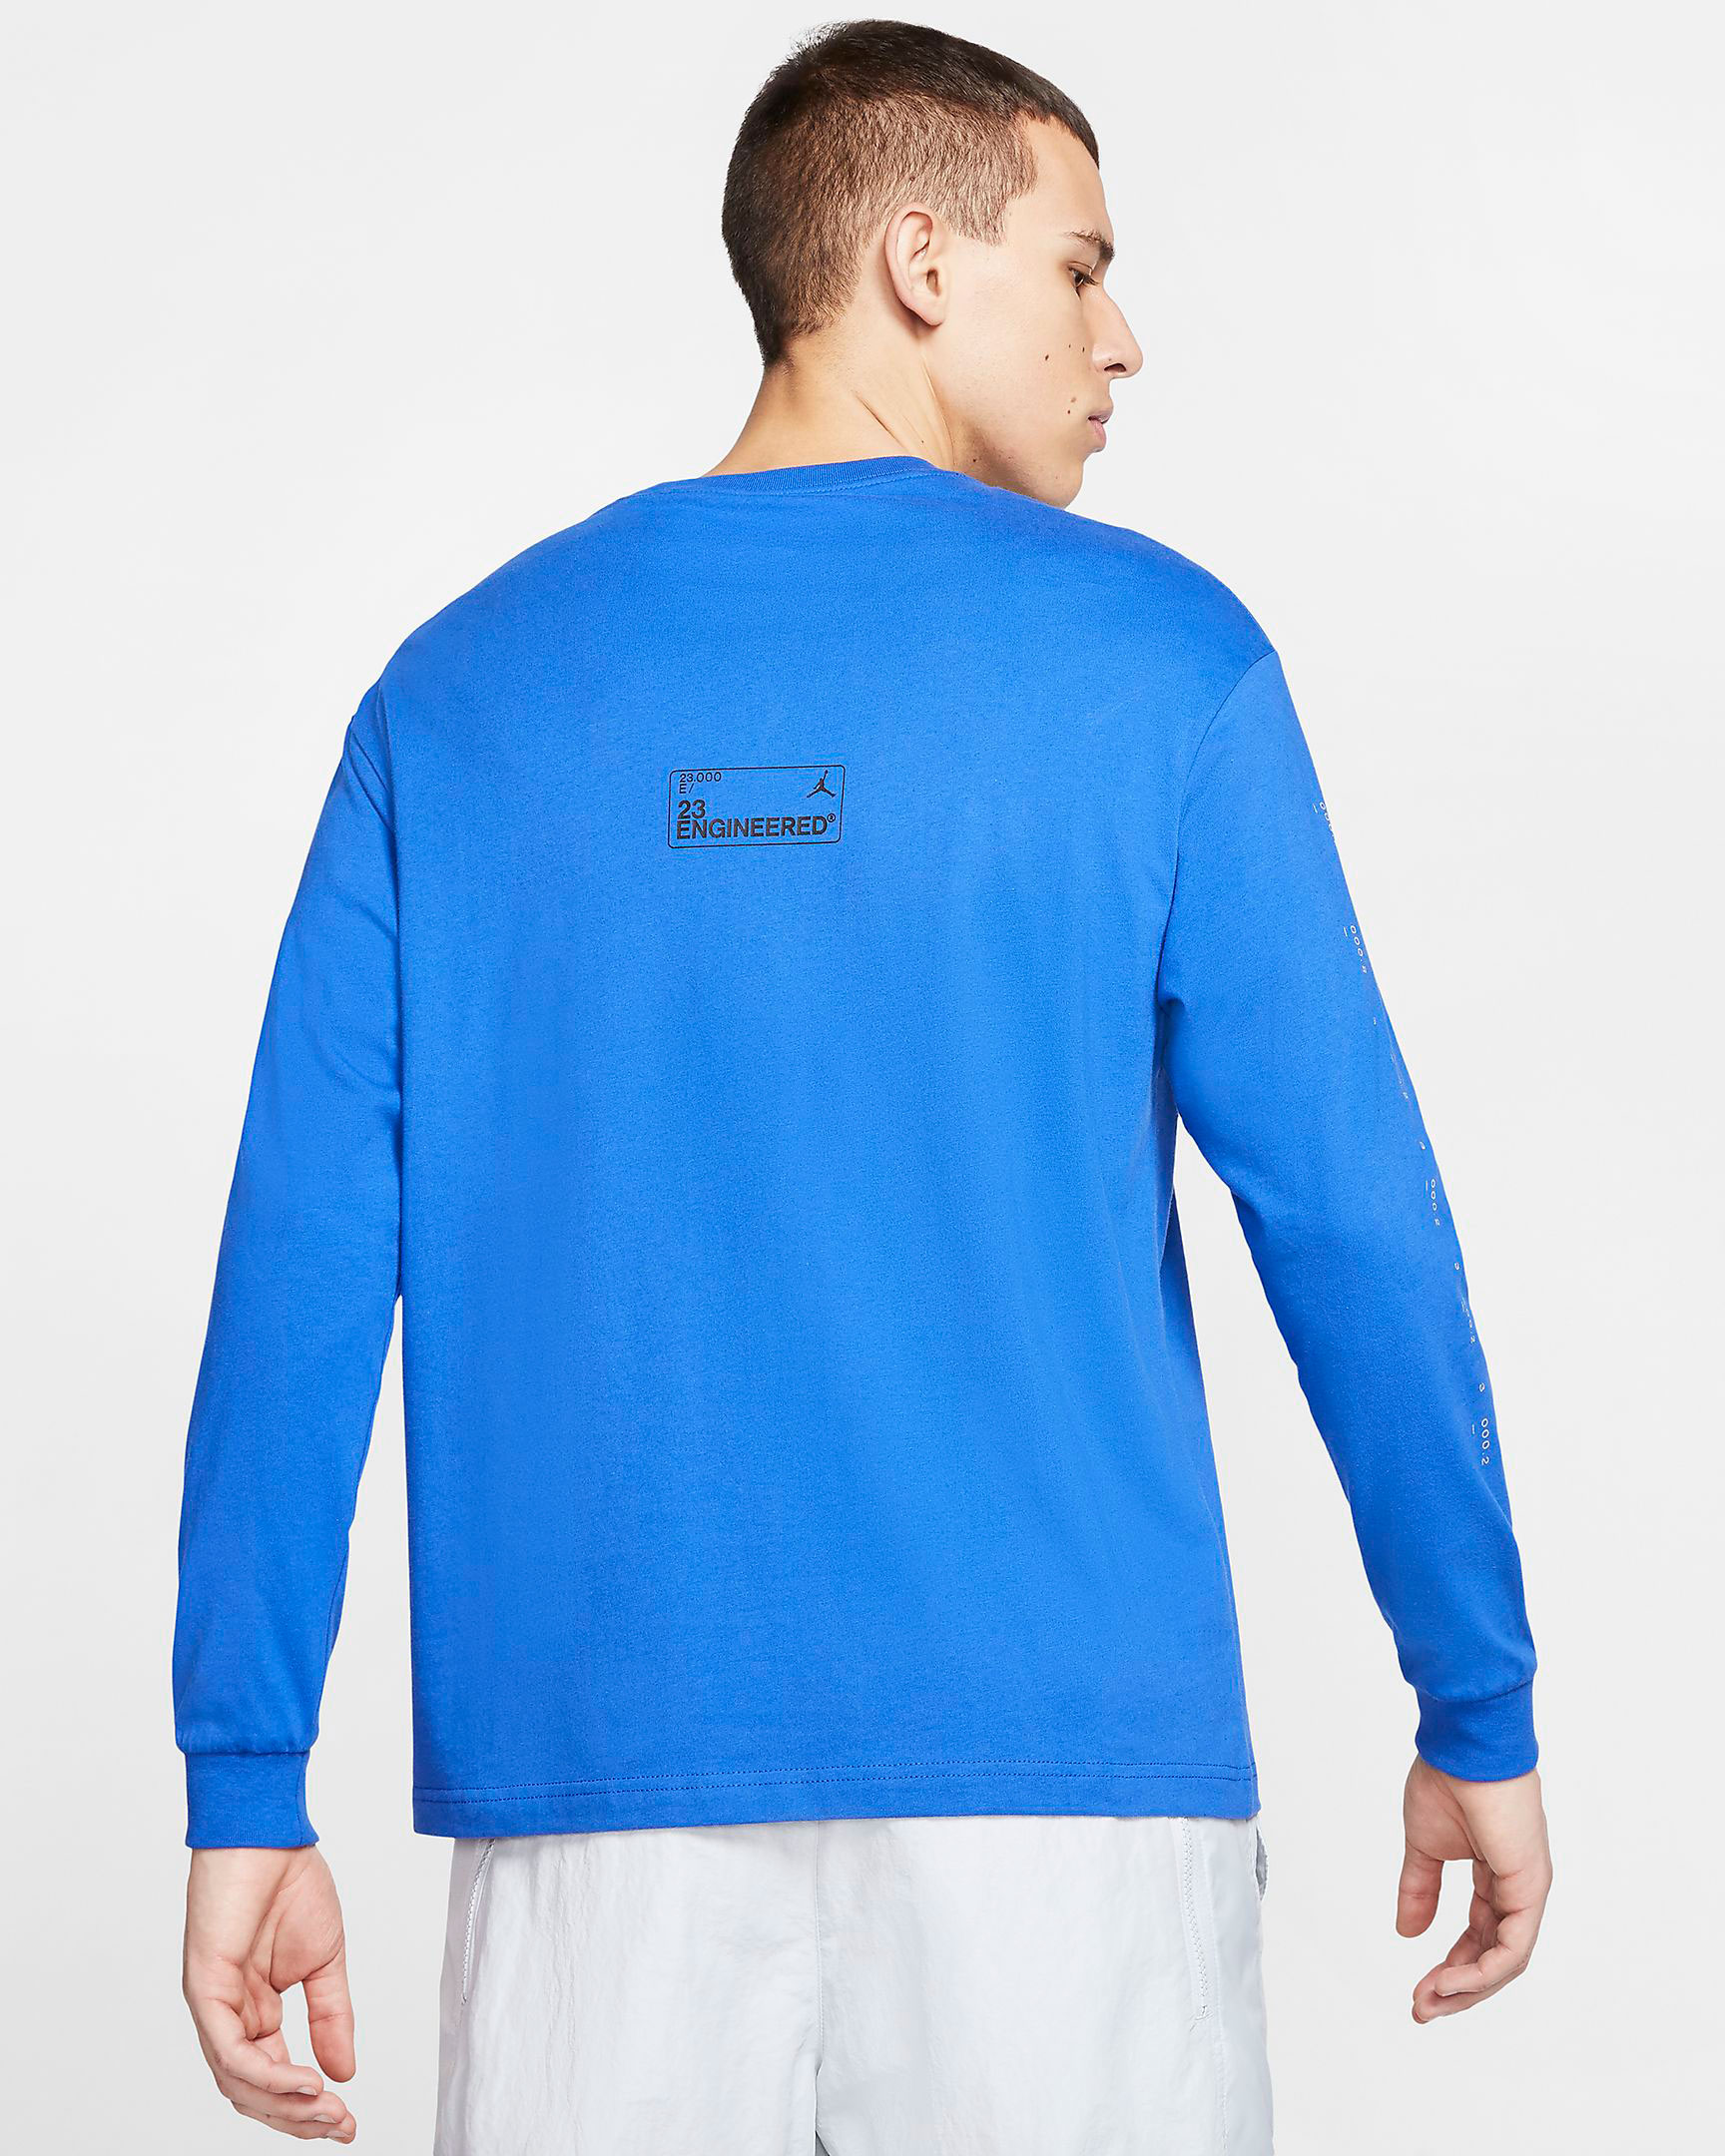 jordan-aerospace-720-lyrical-lemondade-shirt-match-3